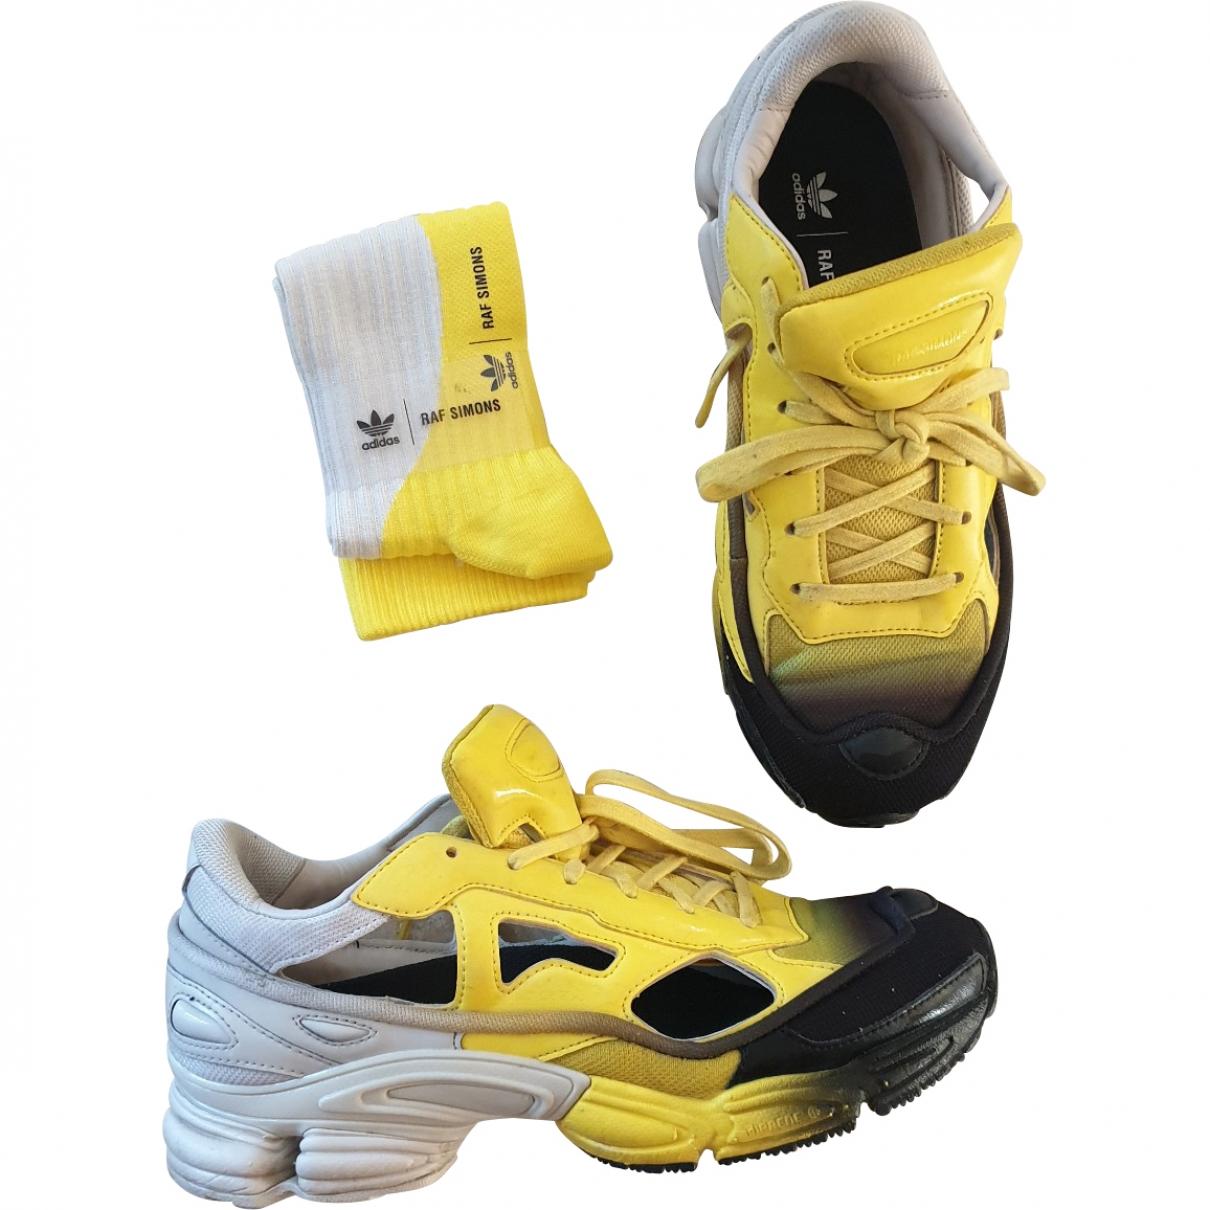 Adidas X Raf Simons Replicant Owzeego Sneakers in  Gelb Leinen